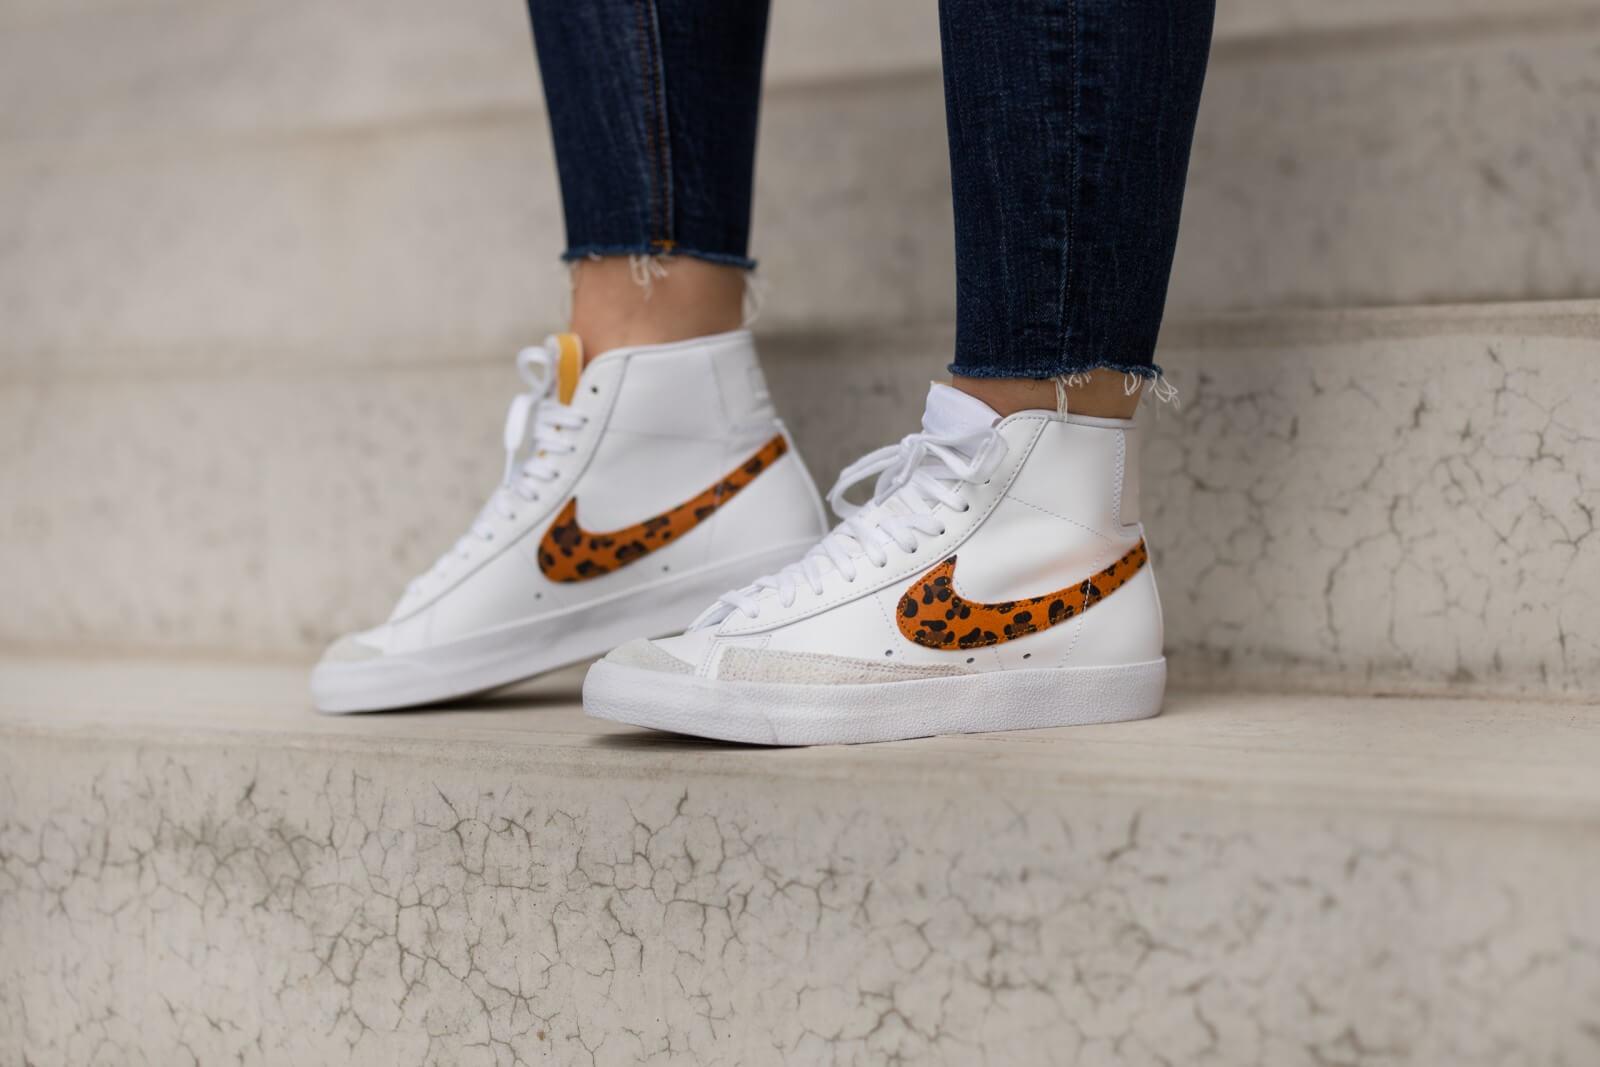 Nike Women's Blazer Mid' 77 Leopard White